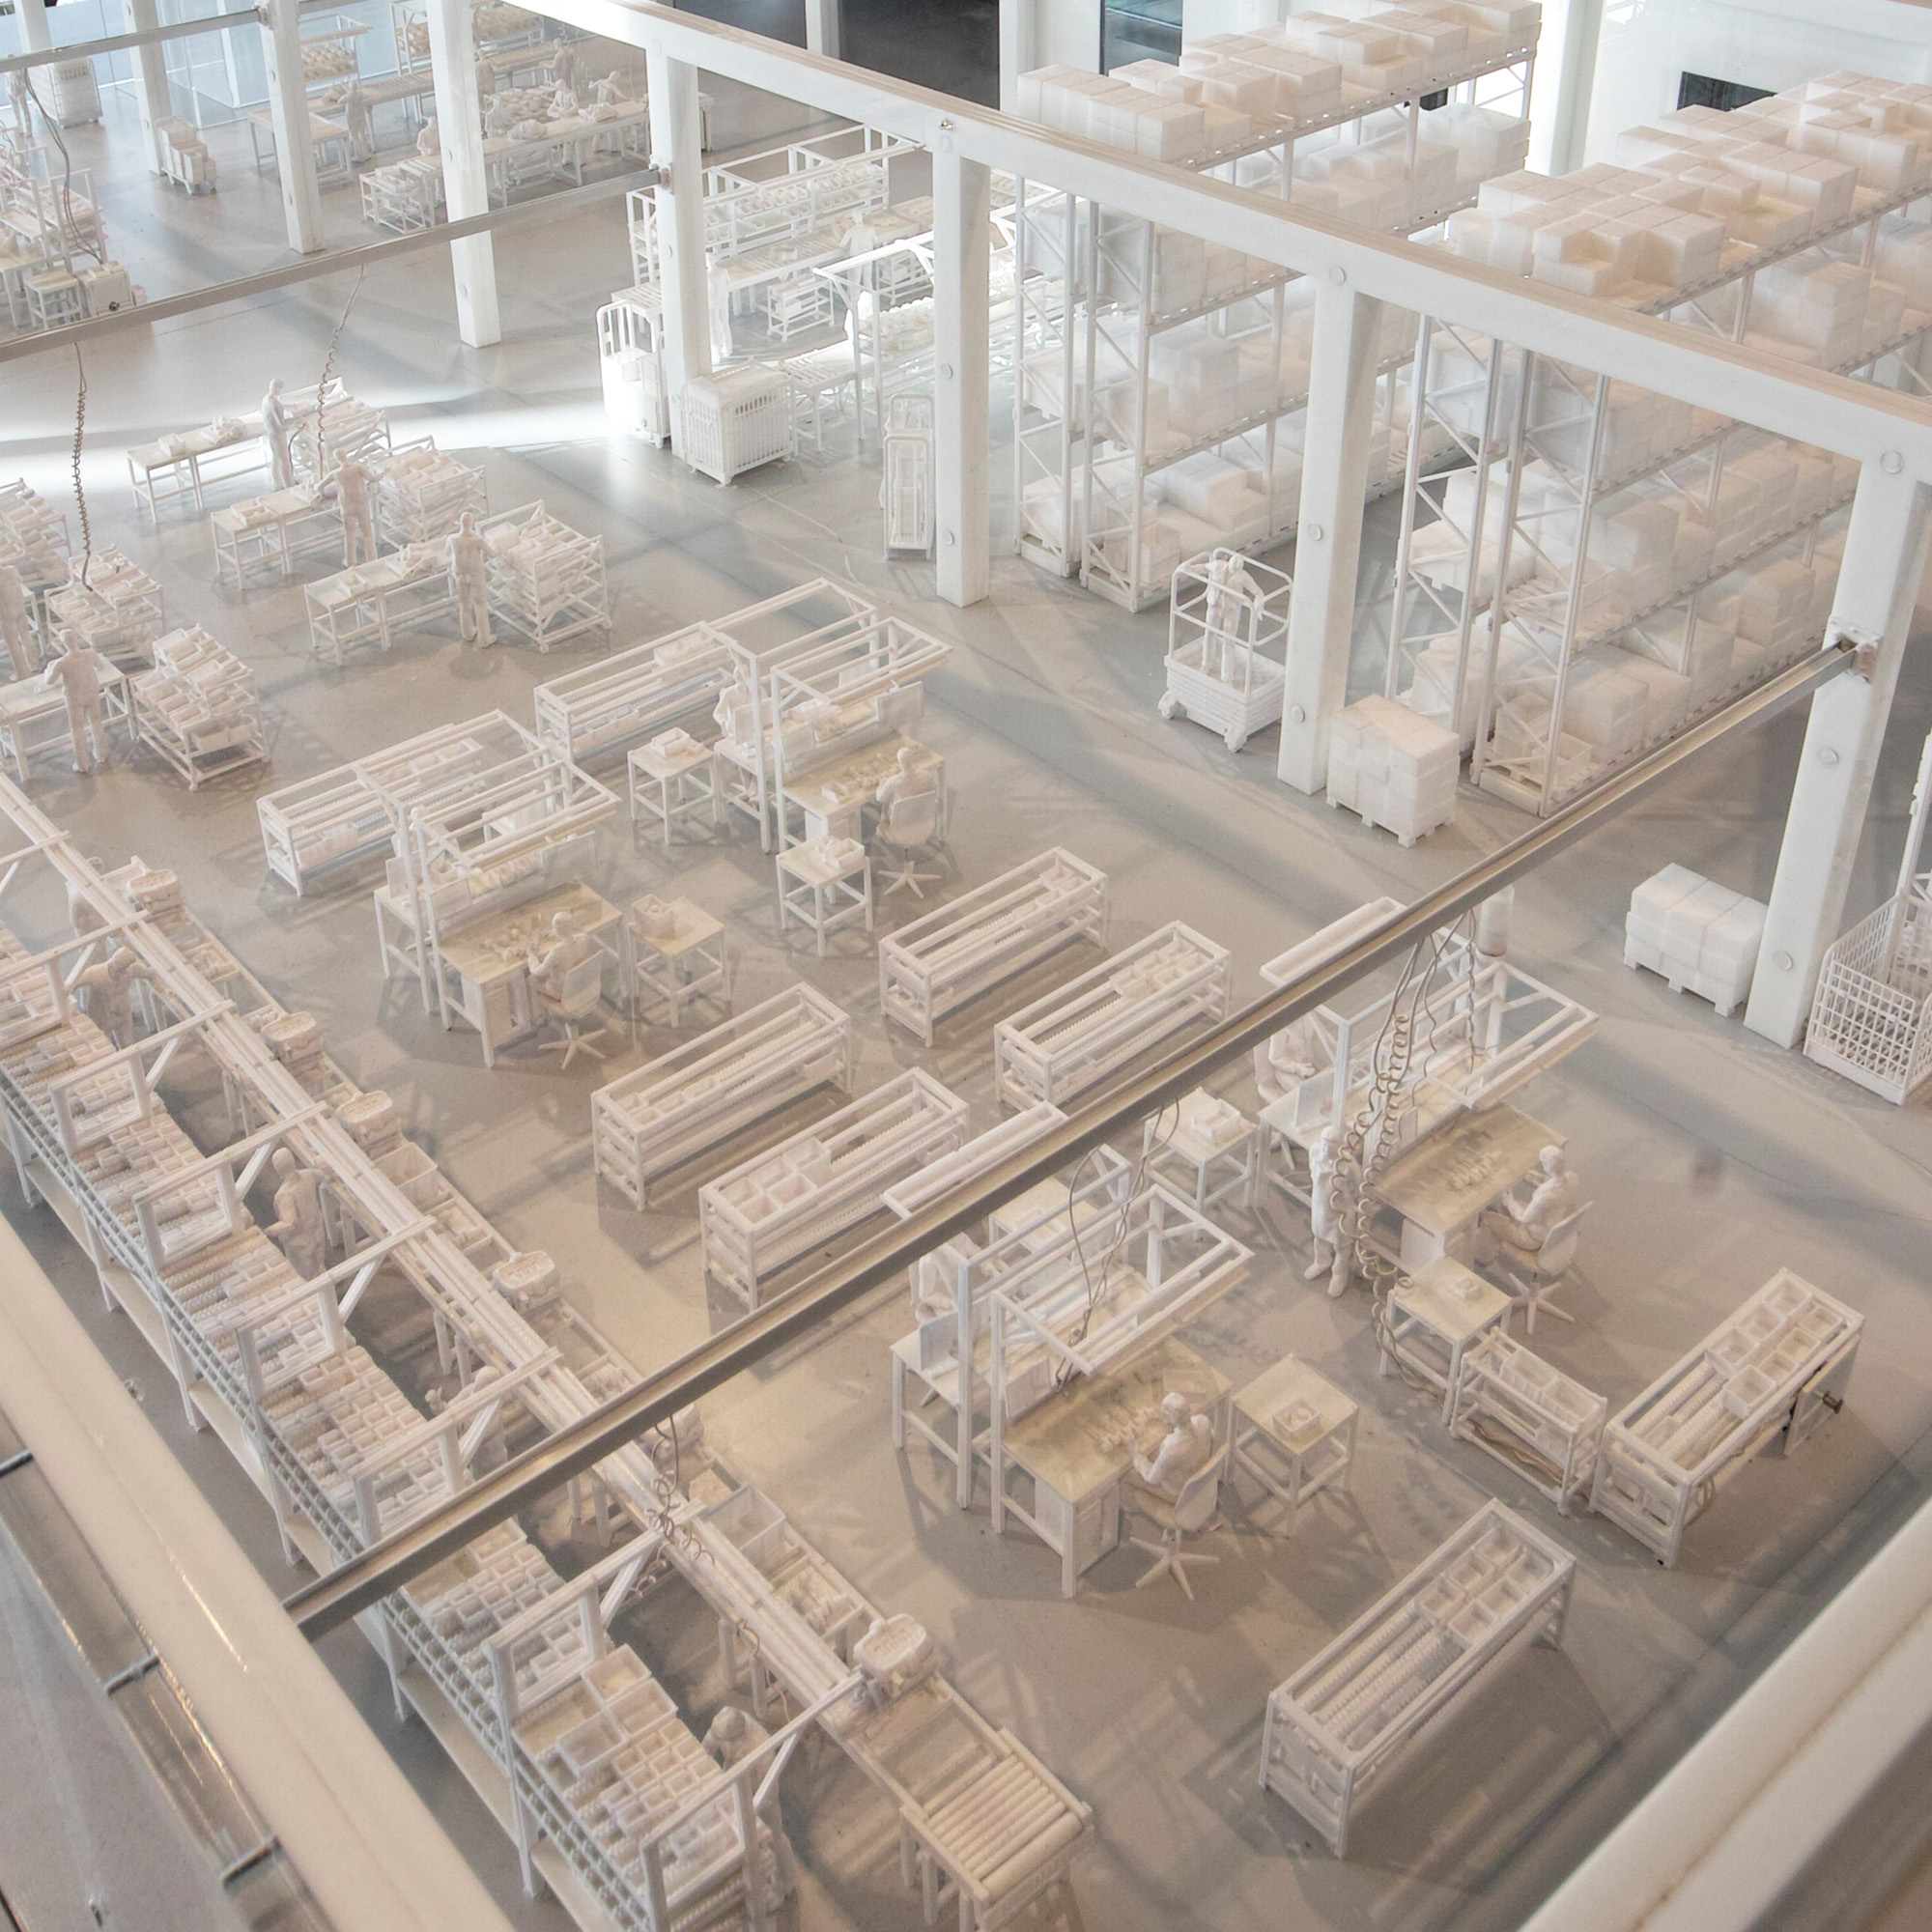 Logimat Exponat Werkshallenmodell komplette Ausstattung